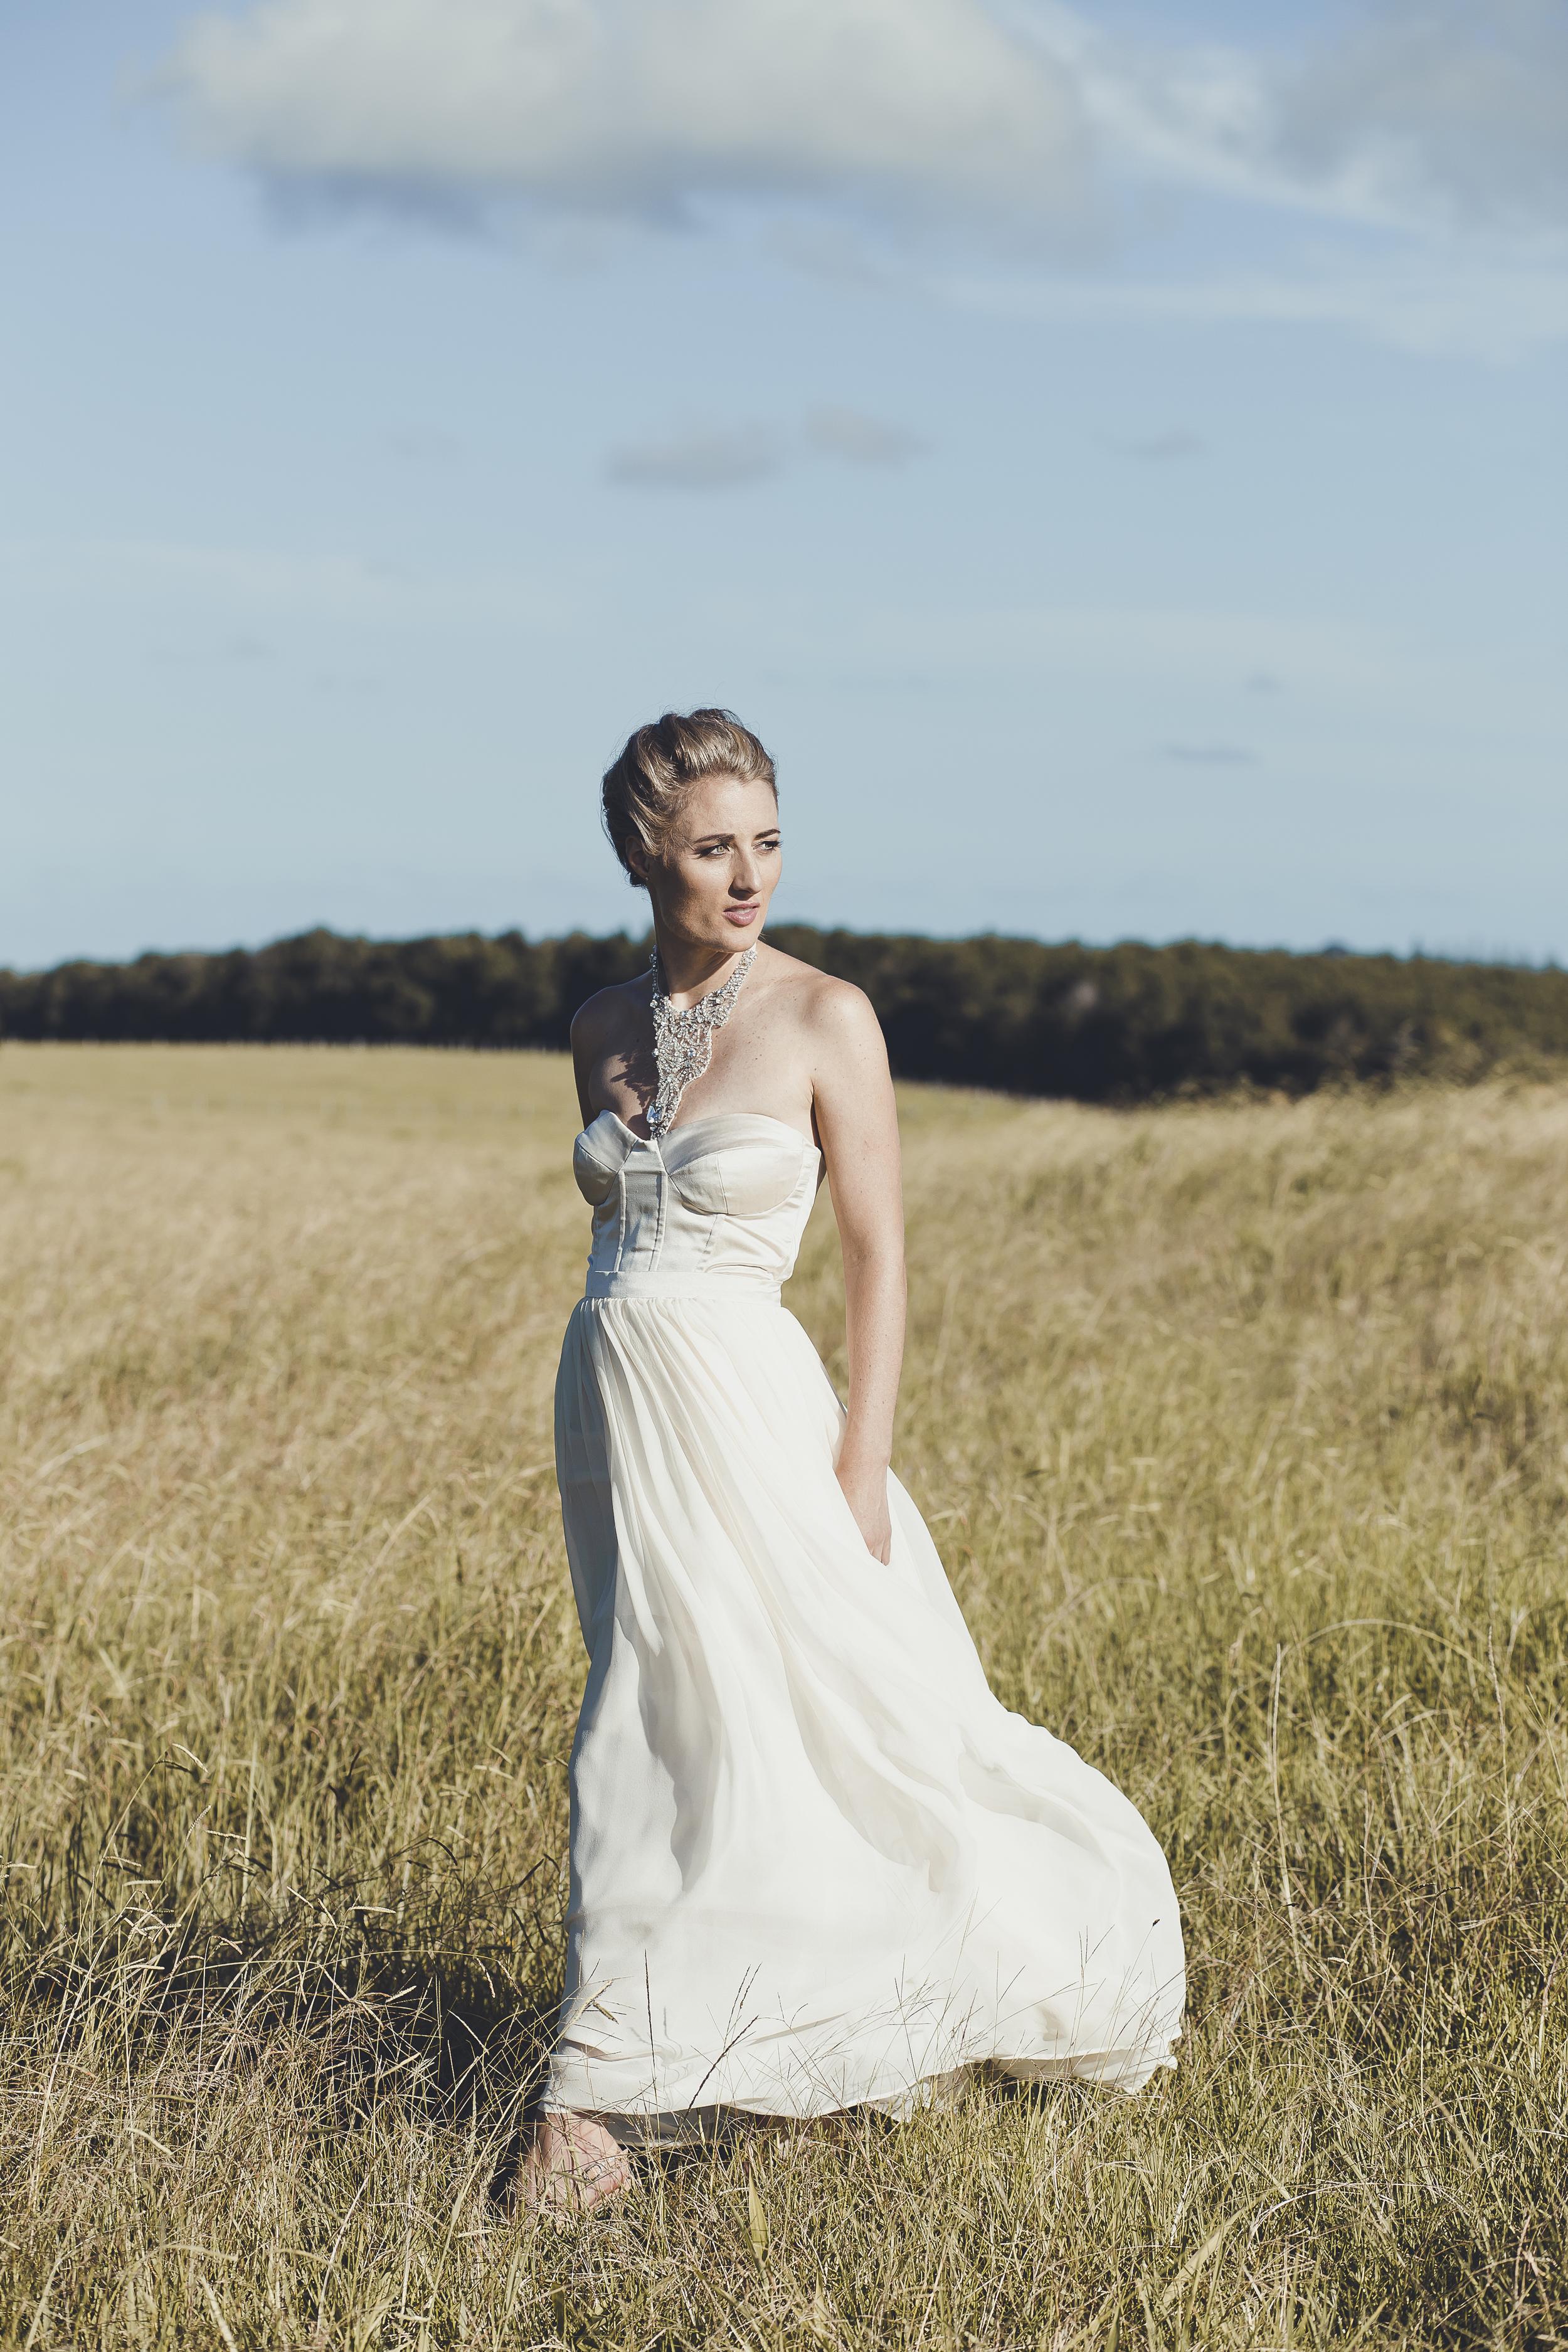 Byron Bay Wedding Harvest Cafe - Carly Tia Photography 021.jpg